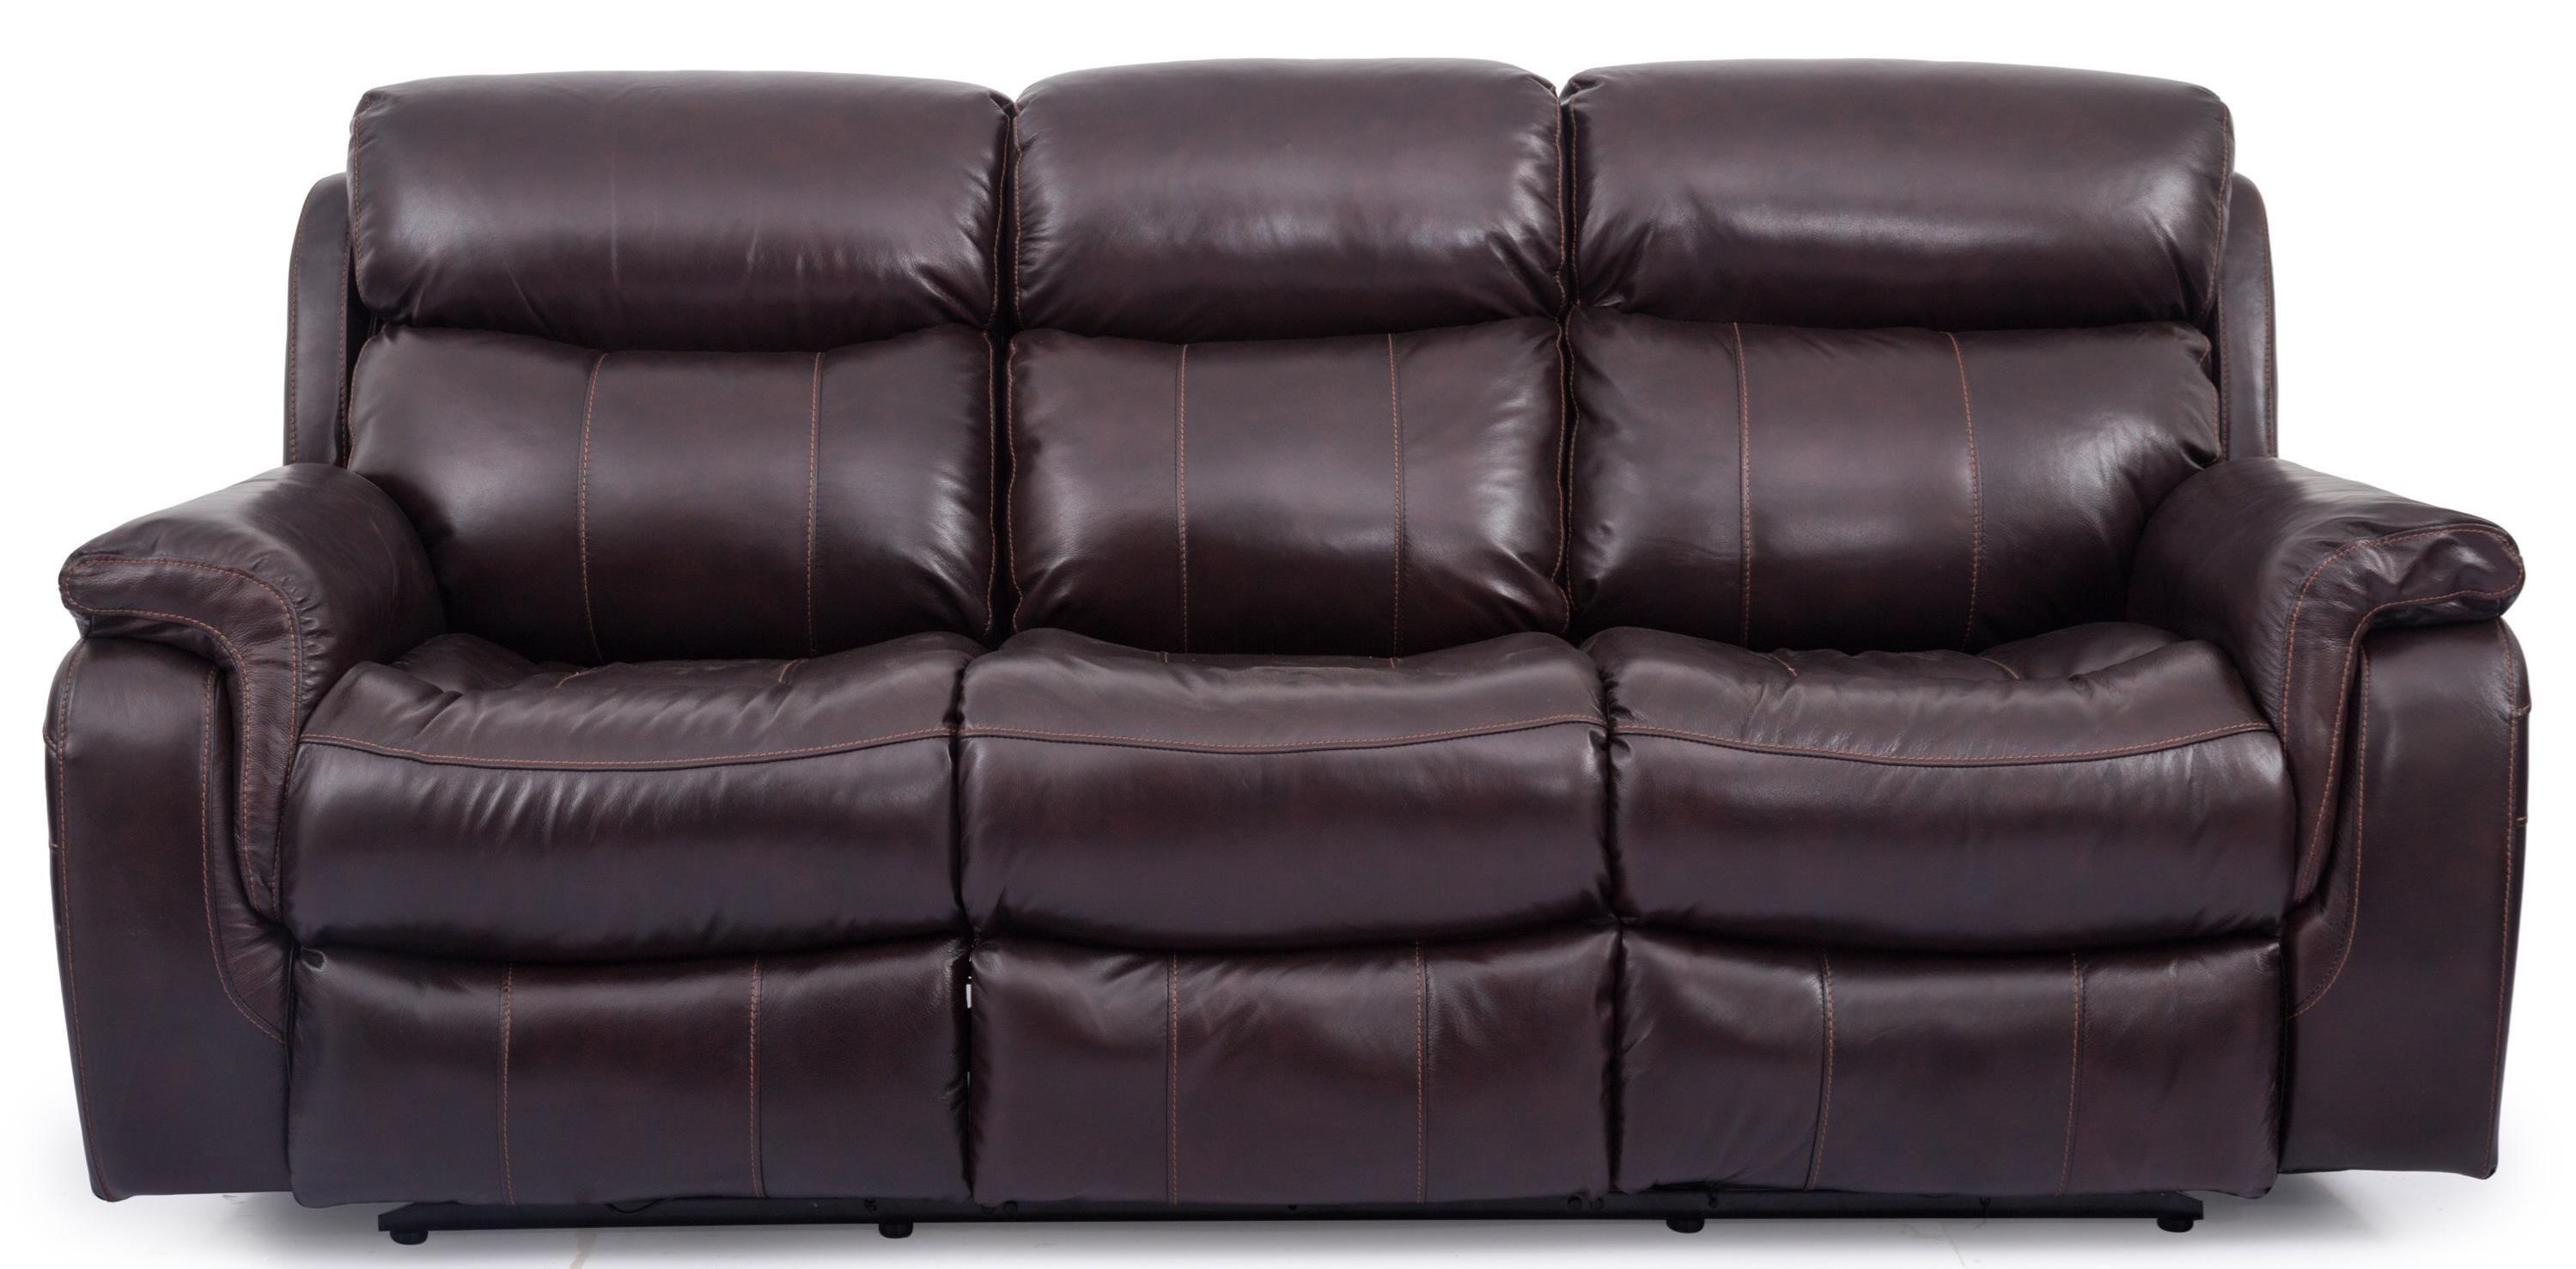 Marvelous Cheers Sofa 9020Power Reclining Sofa